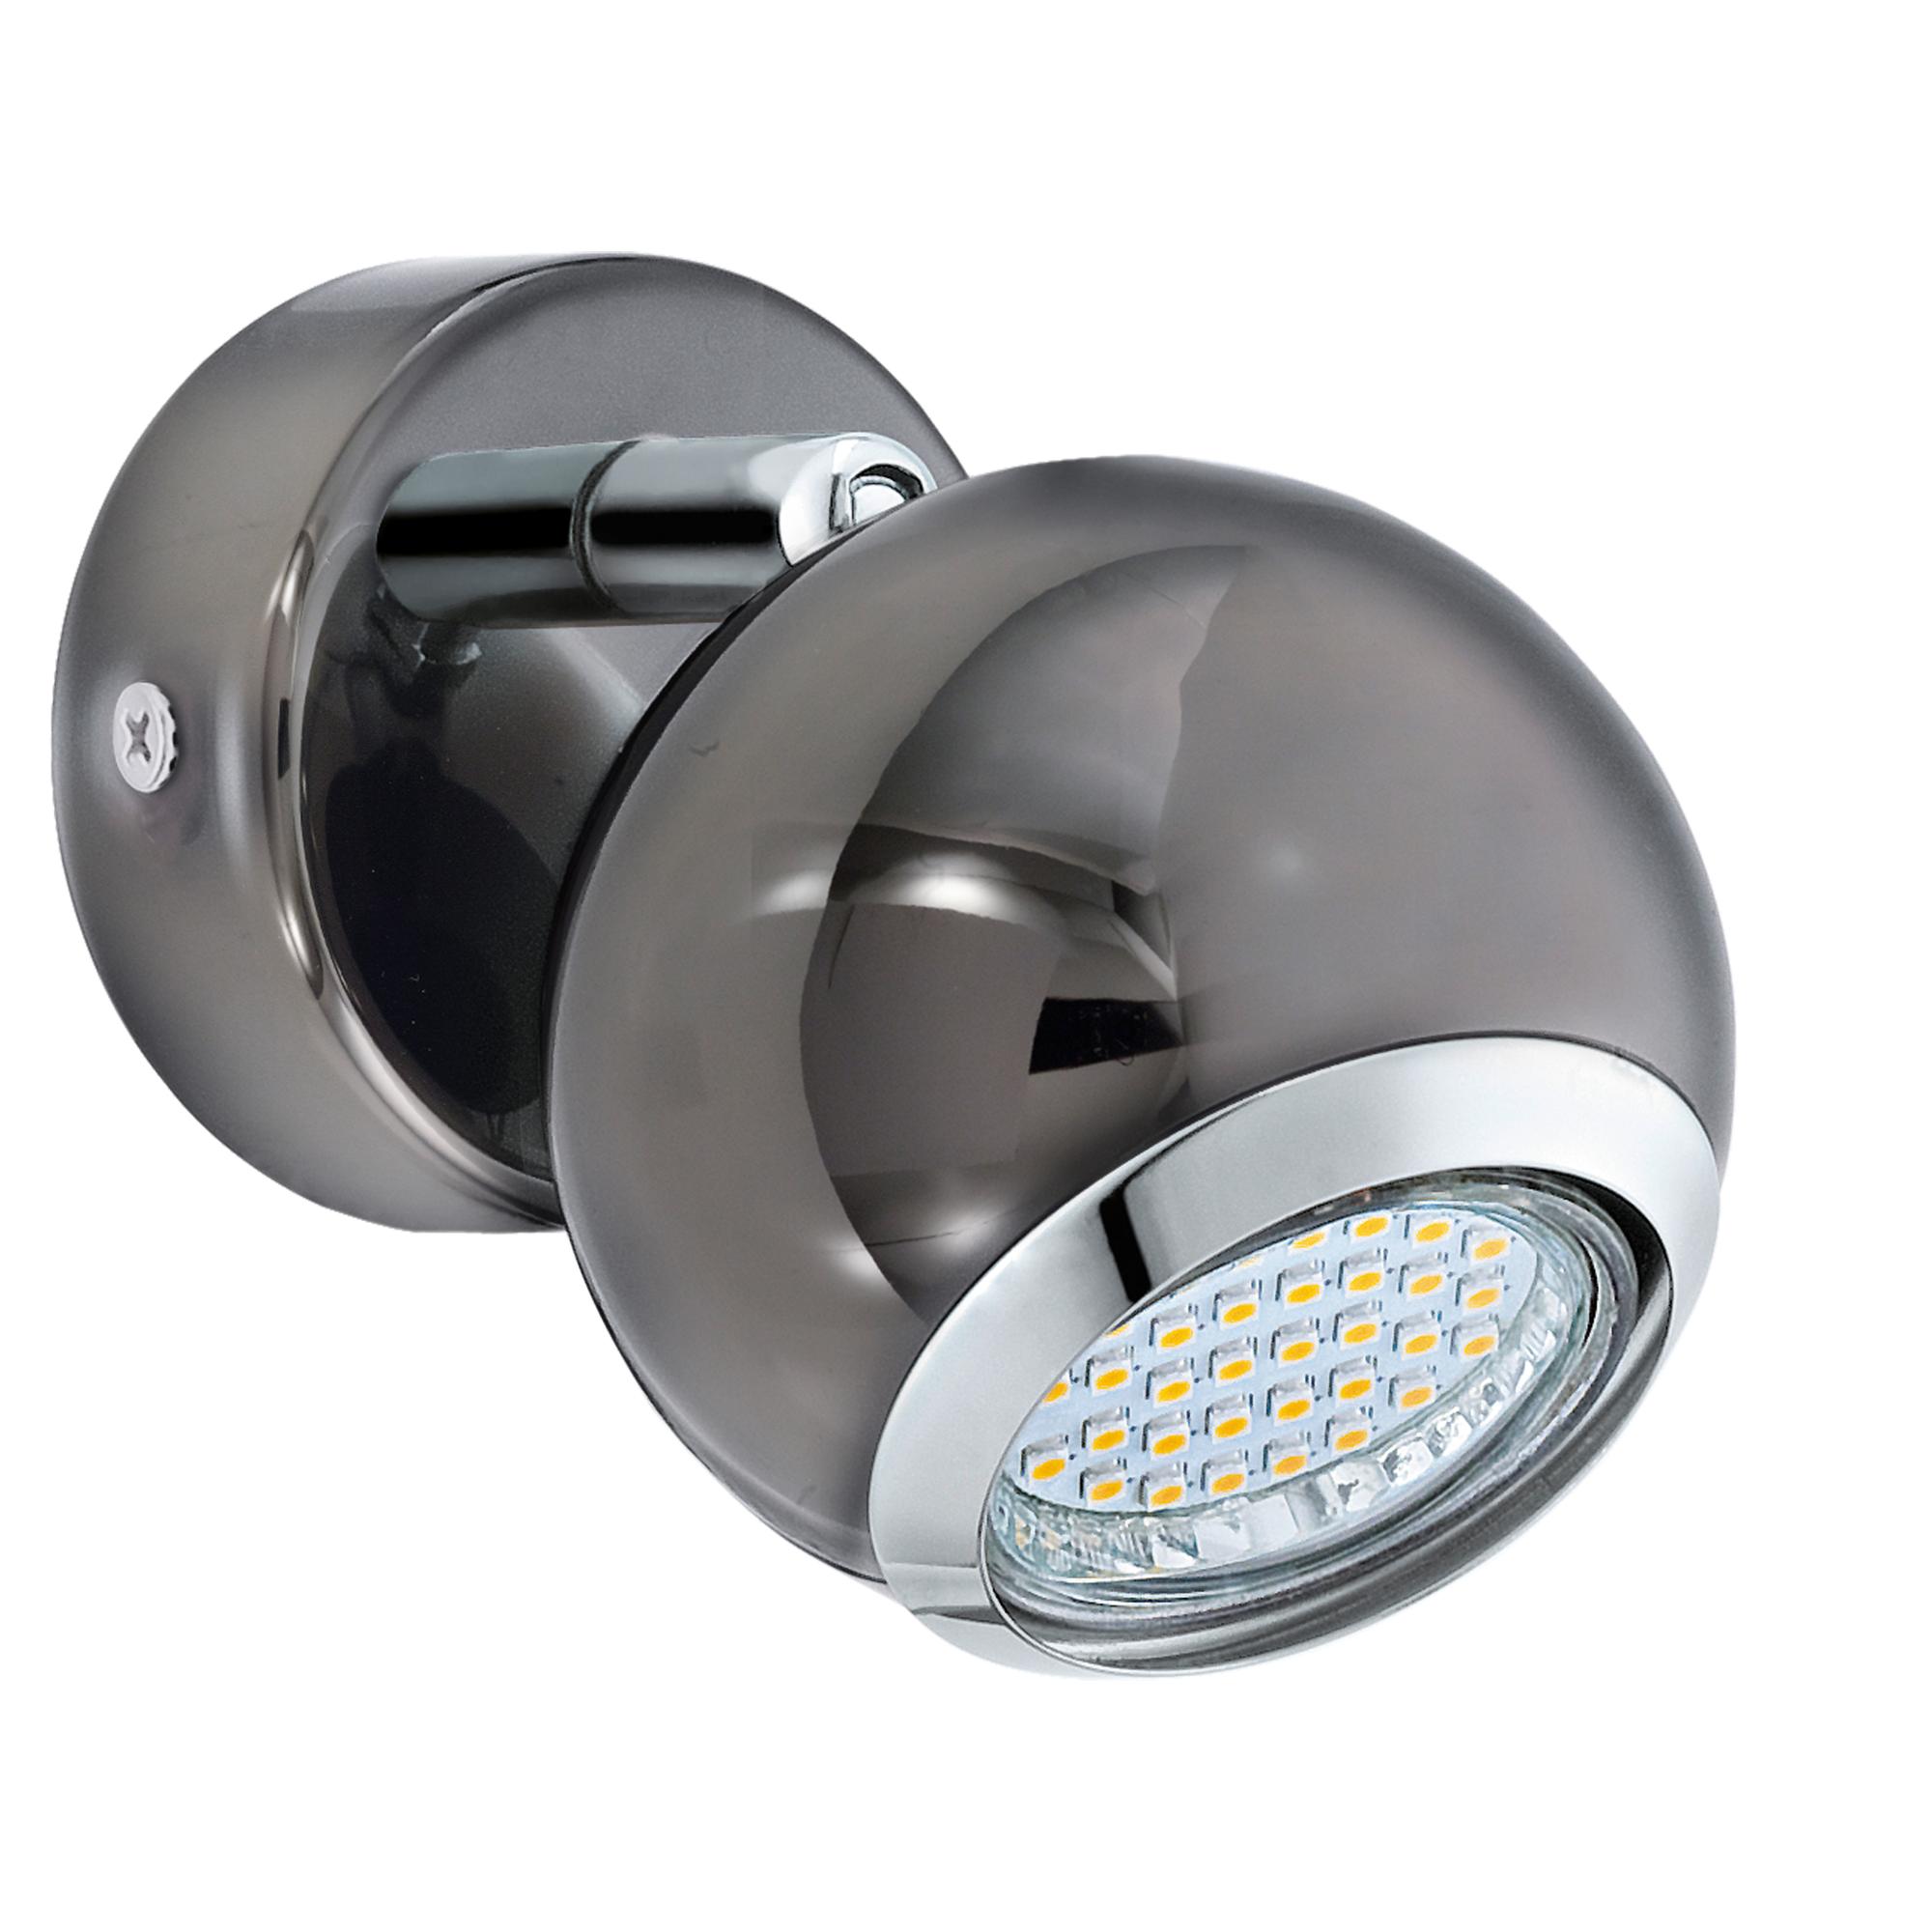 LED-Strahler mit kugelförmigem Spot